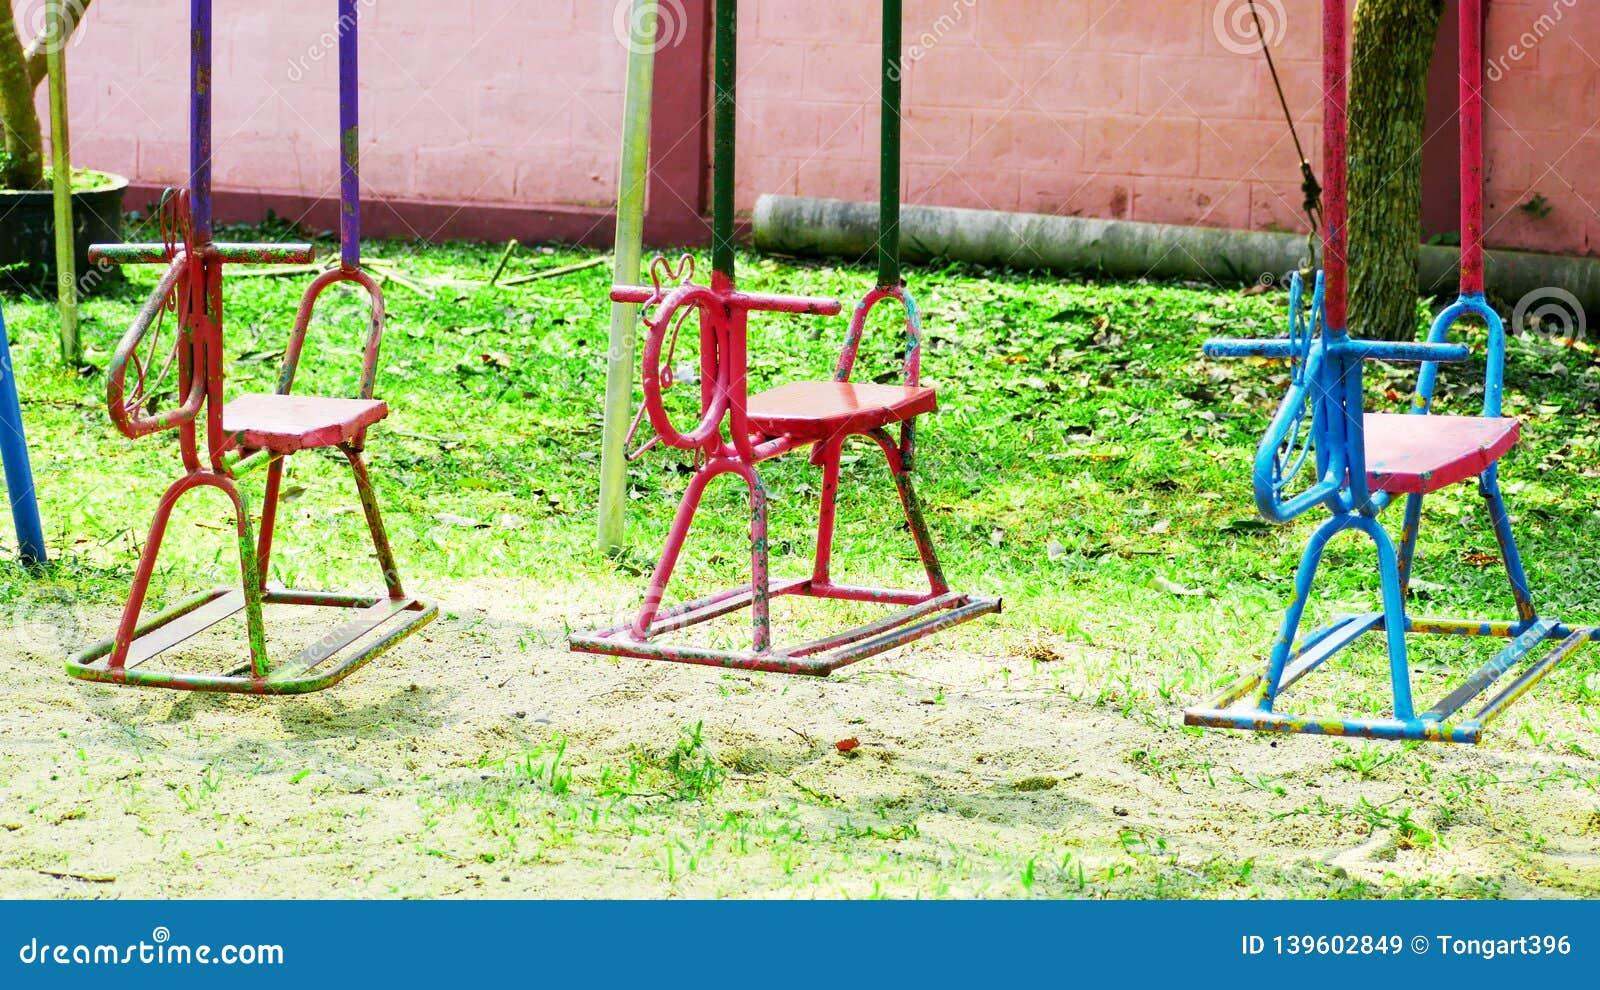 Rocking horse on the playground